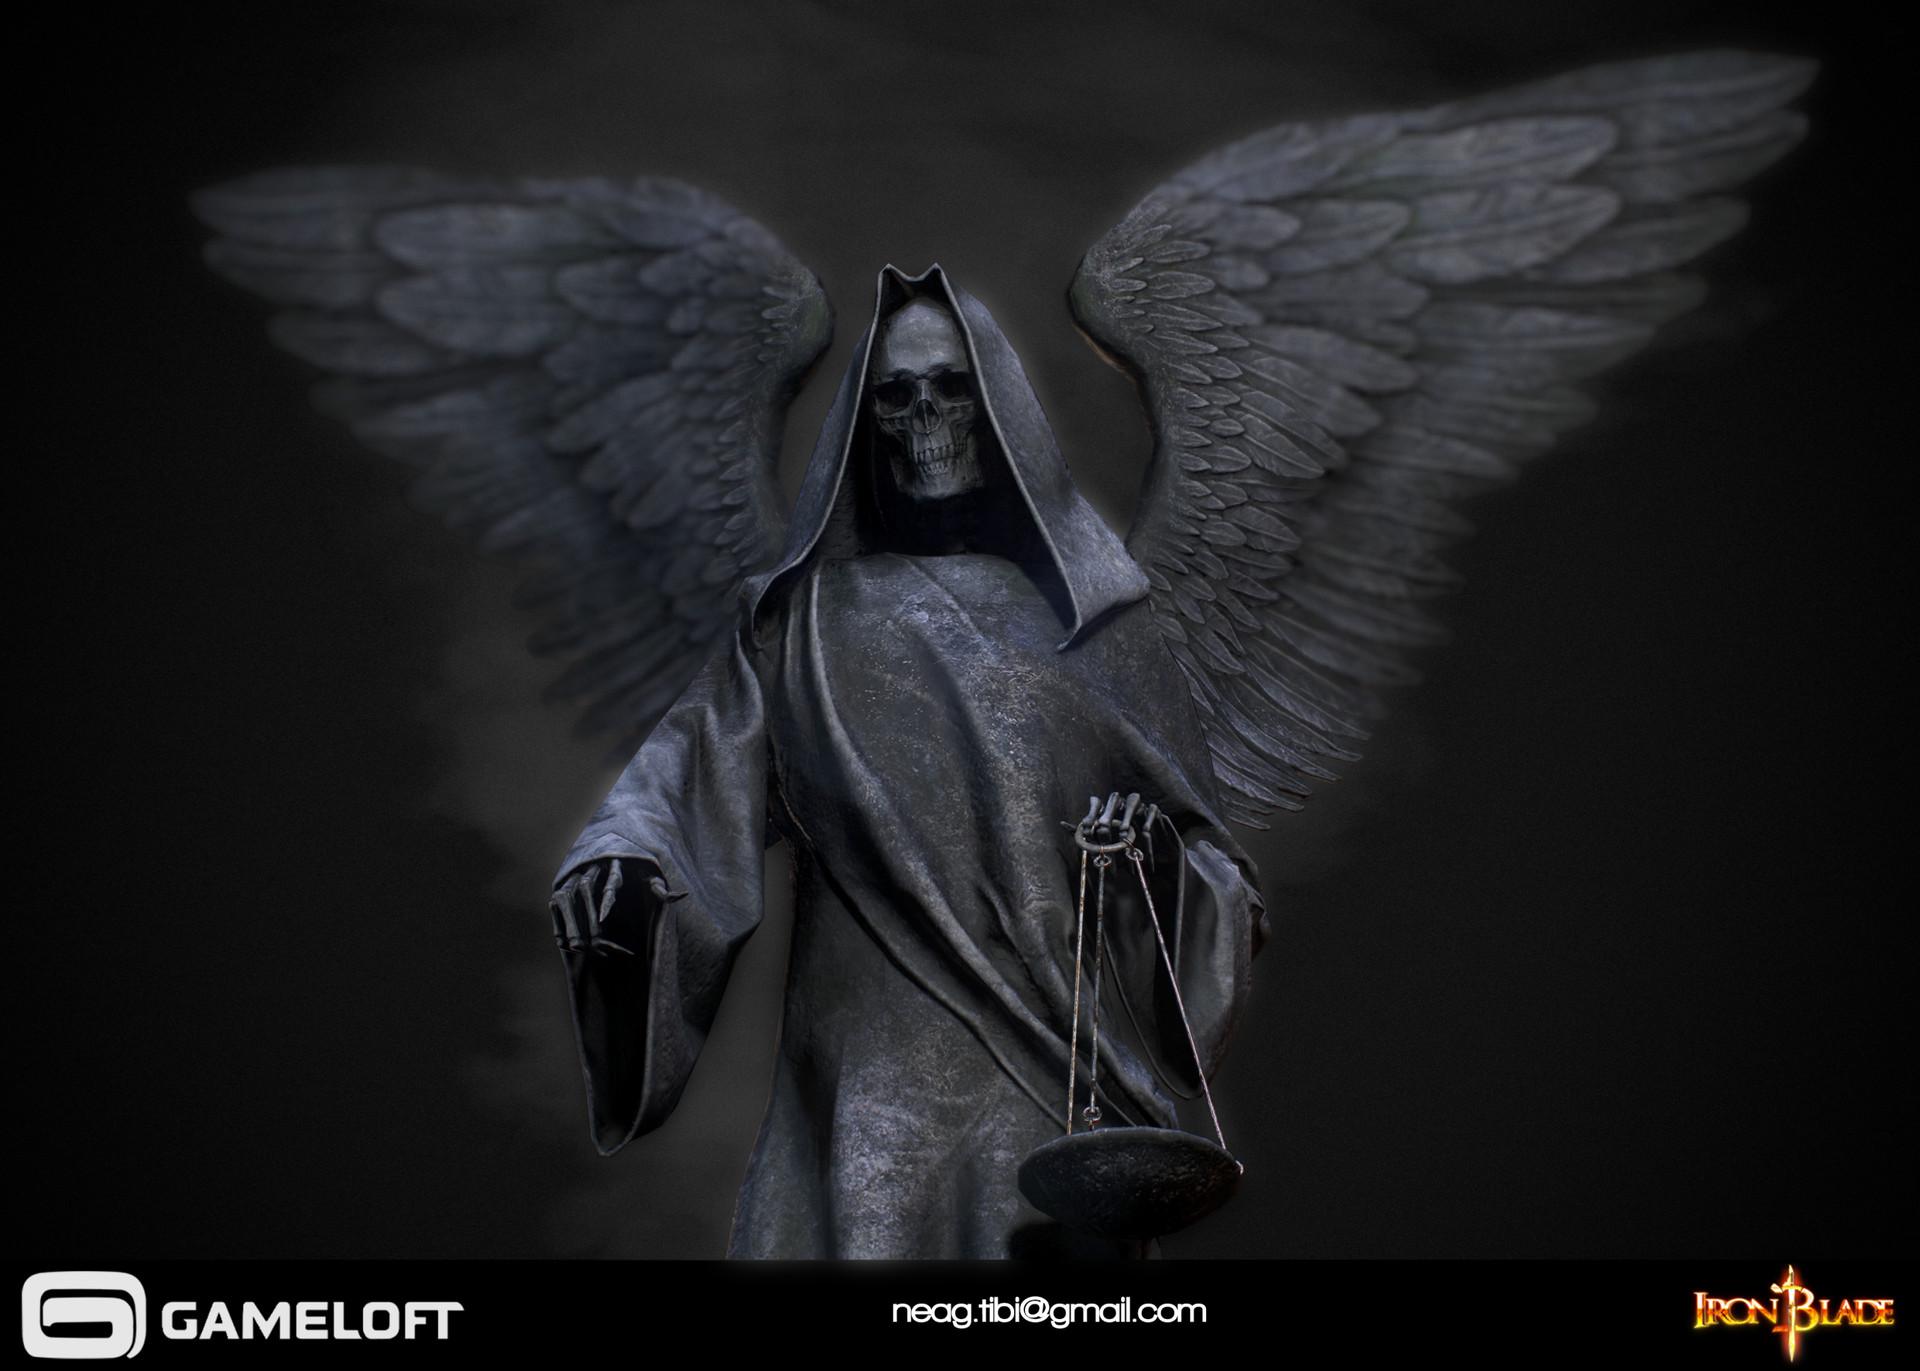 Tibi neag tibi neag iron blade death statue low poly 02 resize